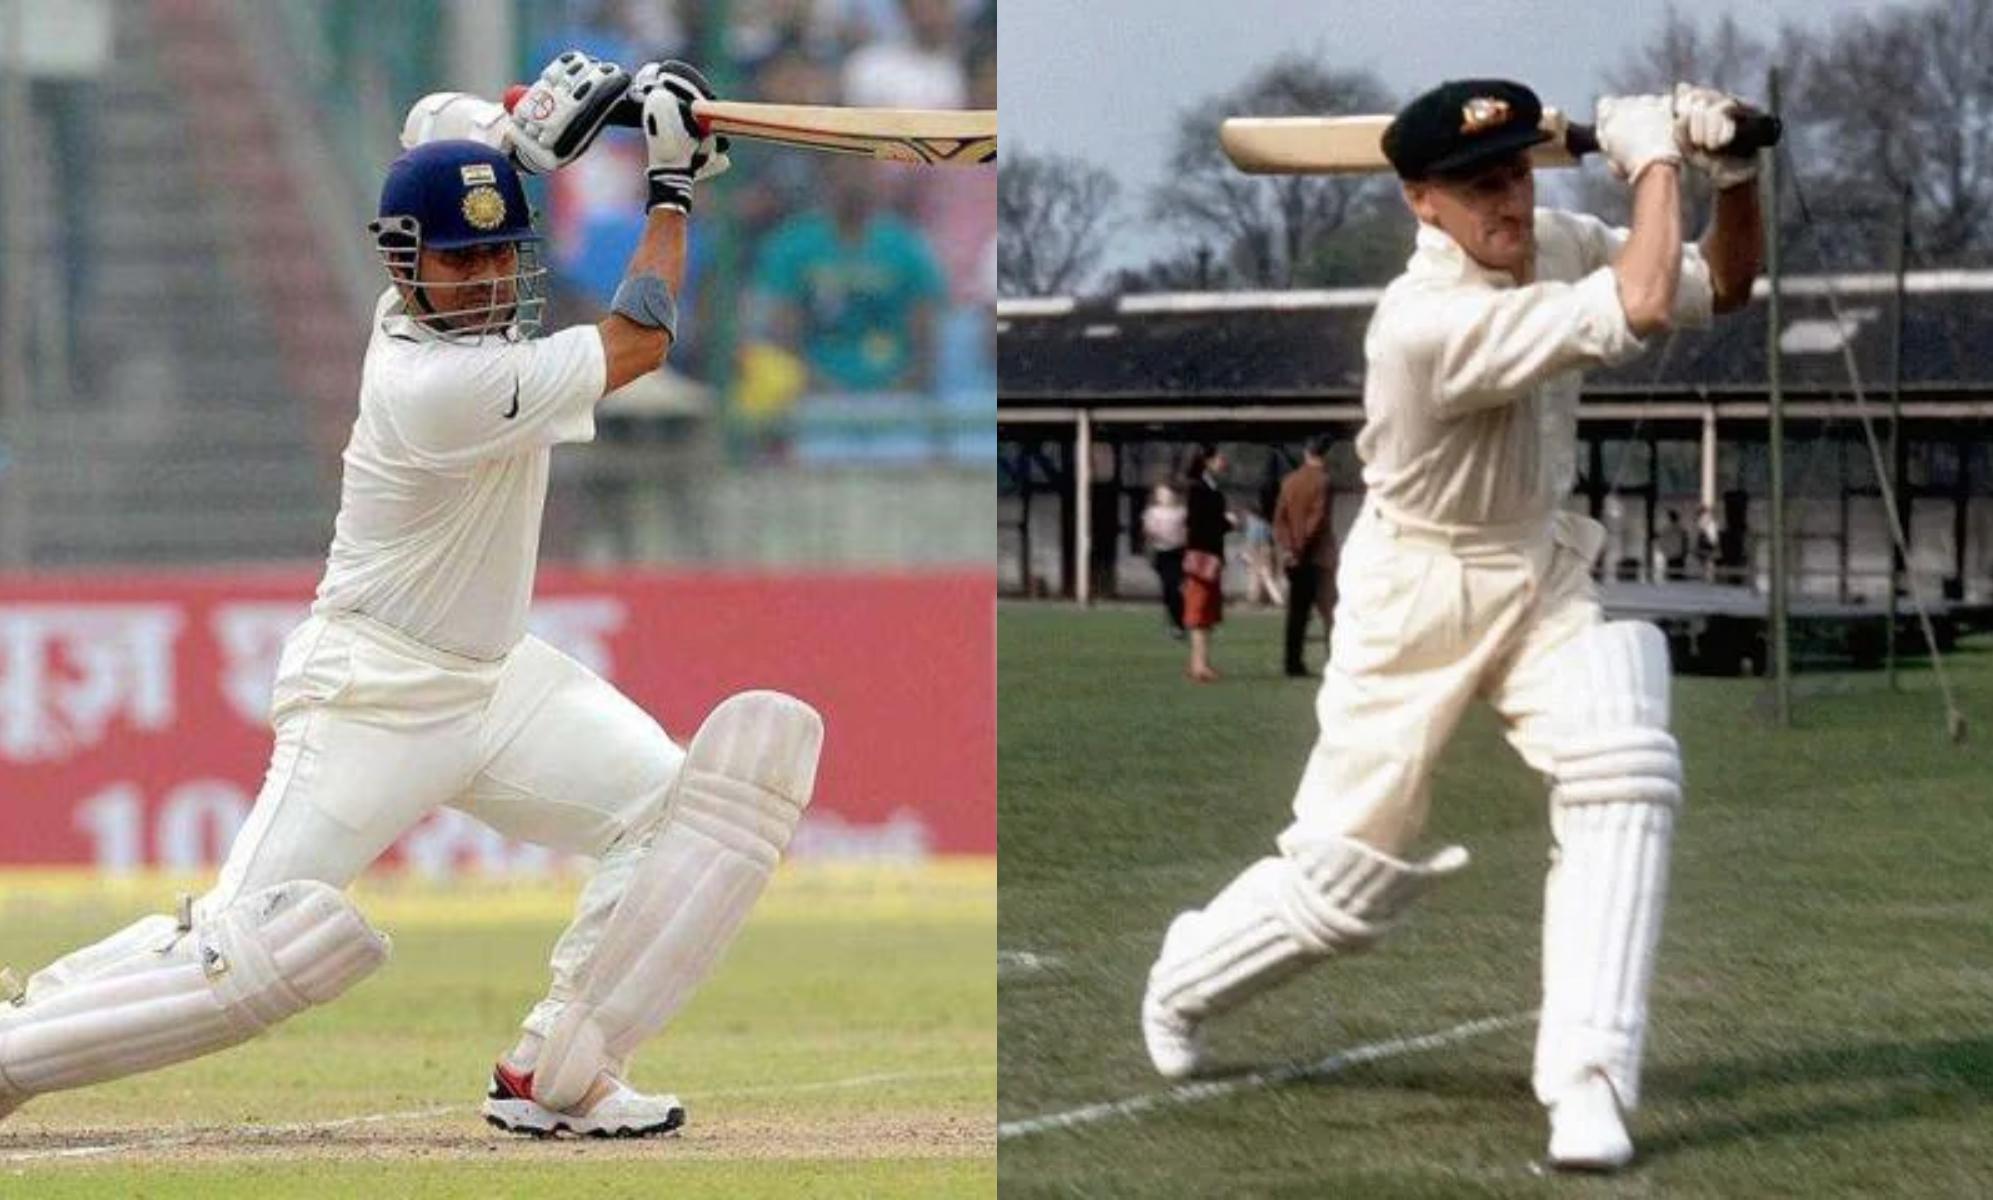 Sachin Tendulkar and Sir Don Bradman- two of the greatest right-handed batsman ever